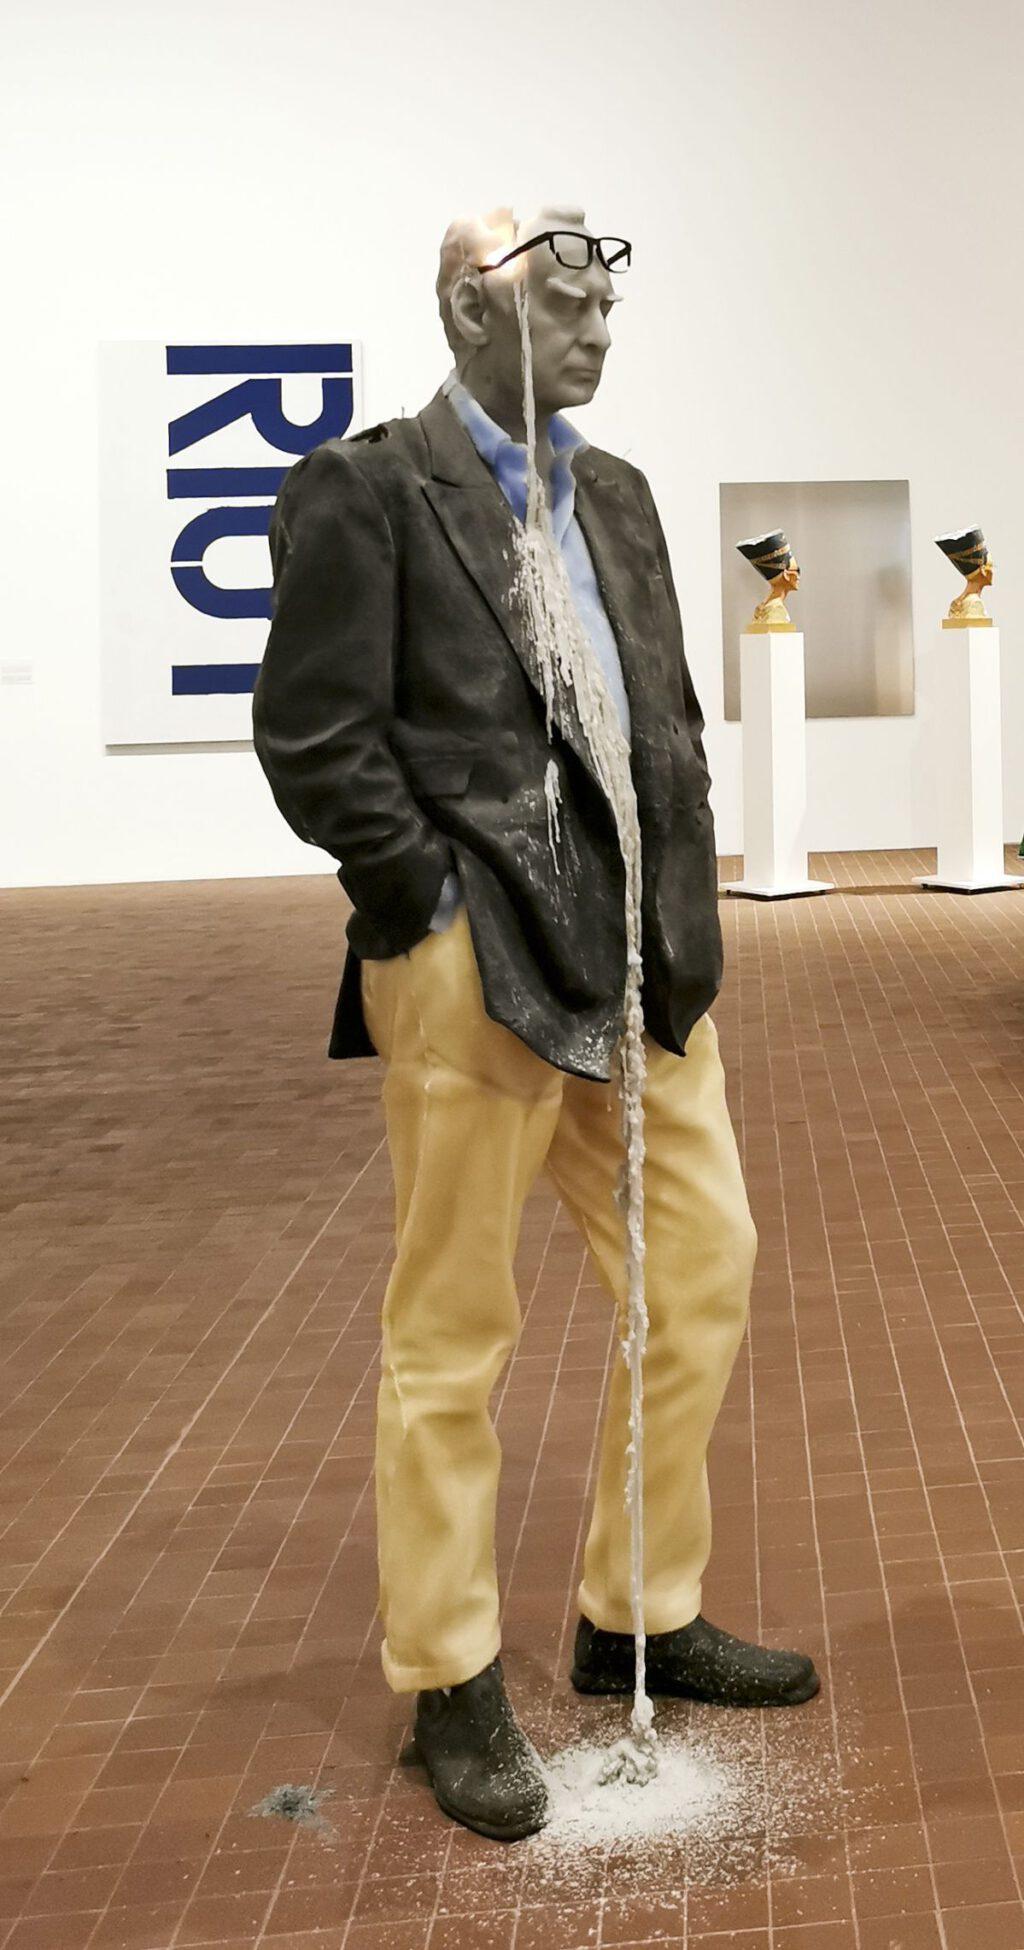 "Urs Fischer ""Untitled"" (2011) (Rudi Candle) @ Collection Maja Hoffmann, LUMA Arles"